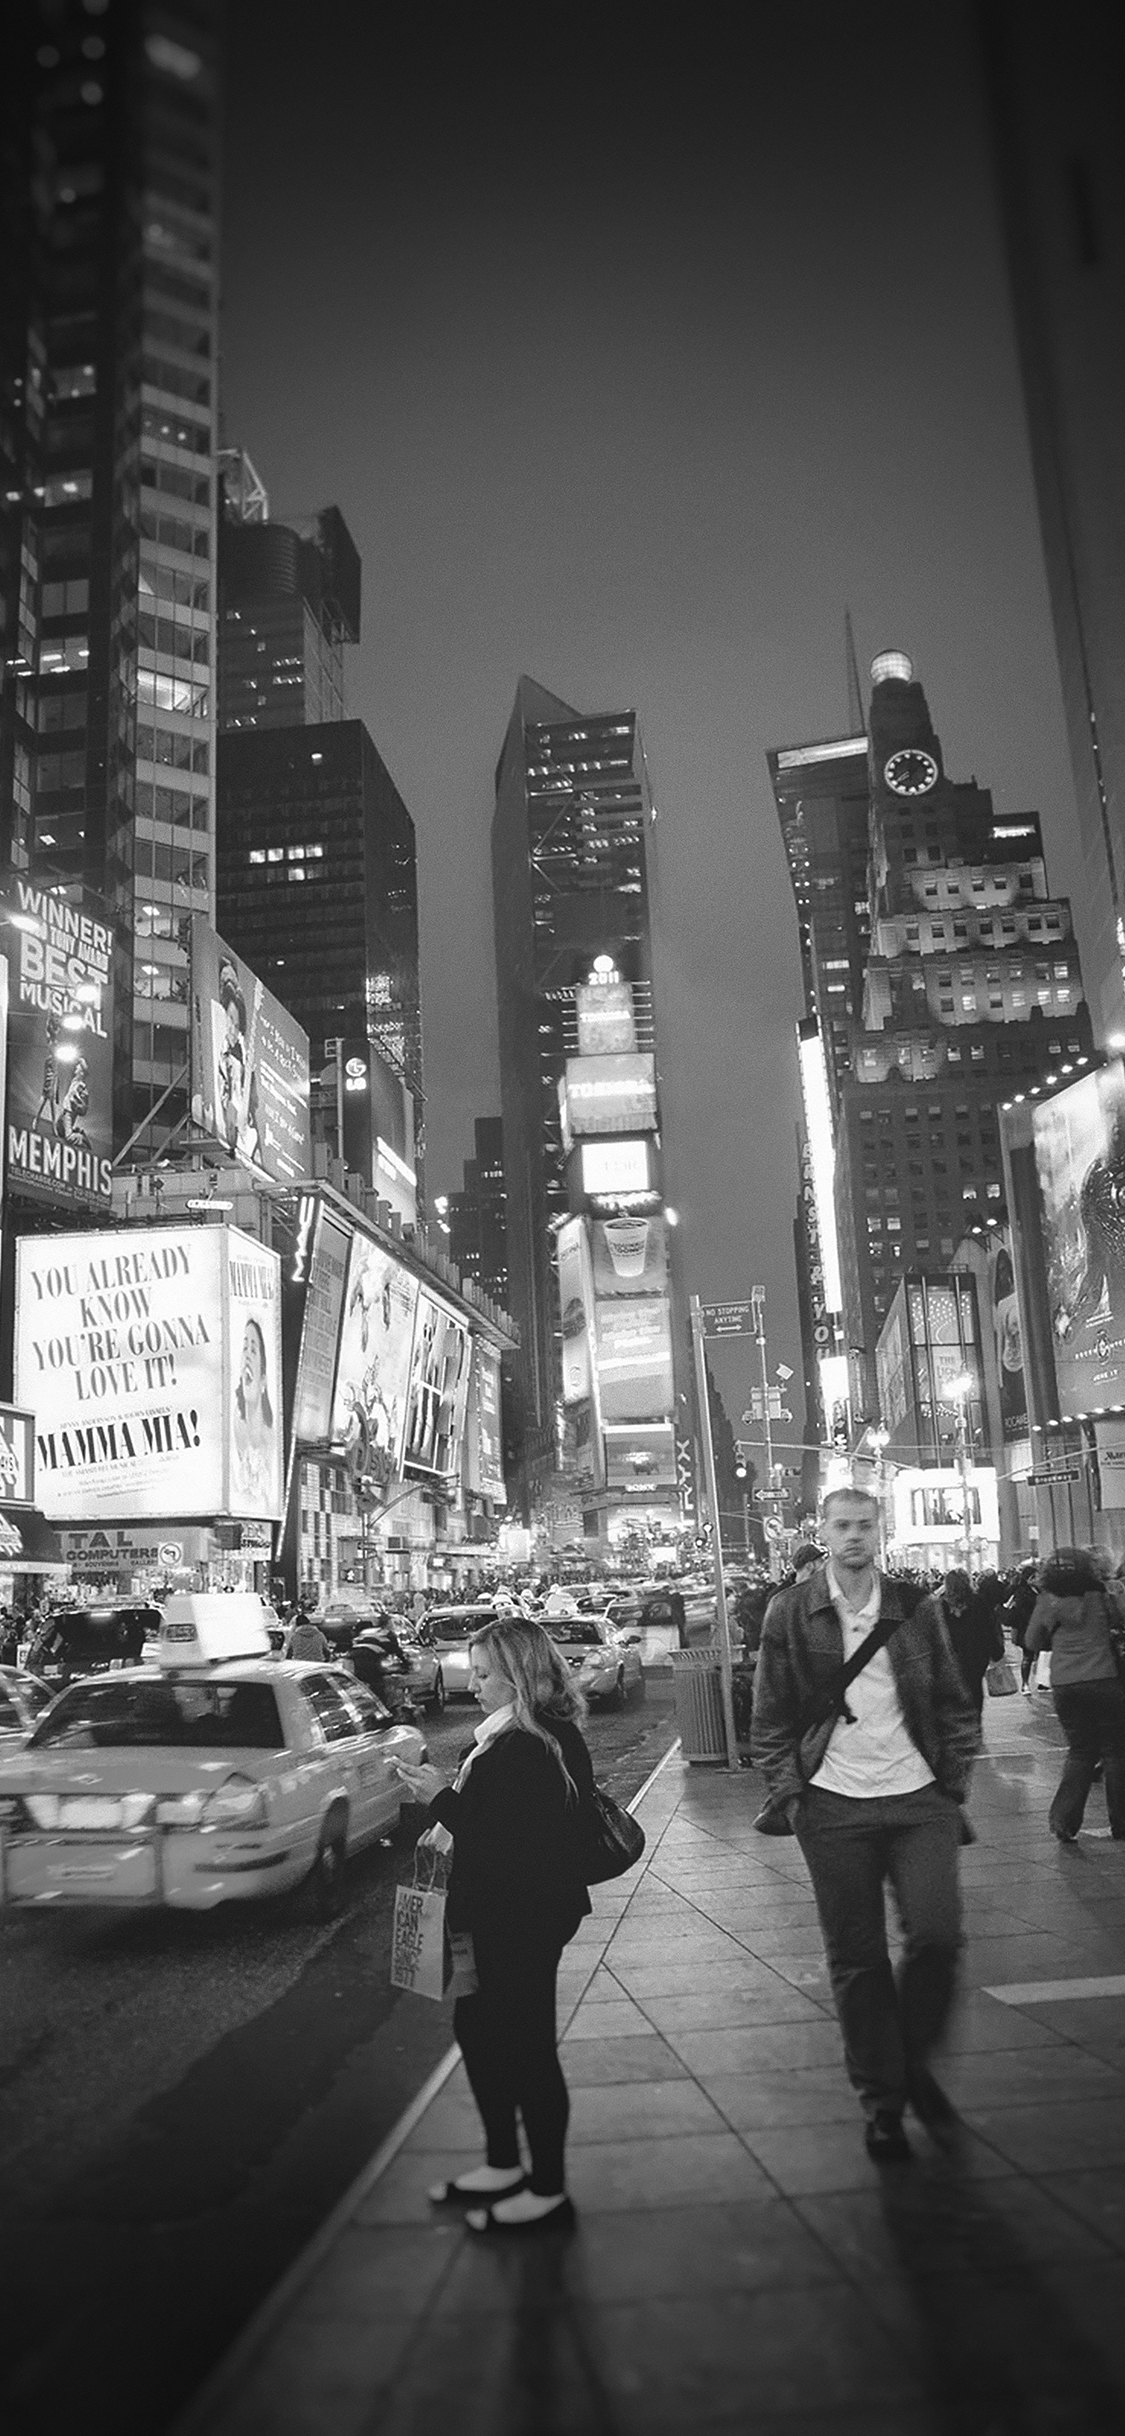 iPhoneXpapers.com-Apple-iPhone-wallpaper-mn66-new-york-street-night-city-dark-bw-vignette